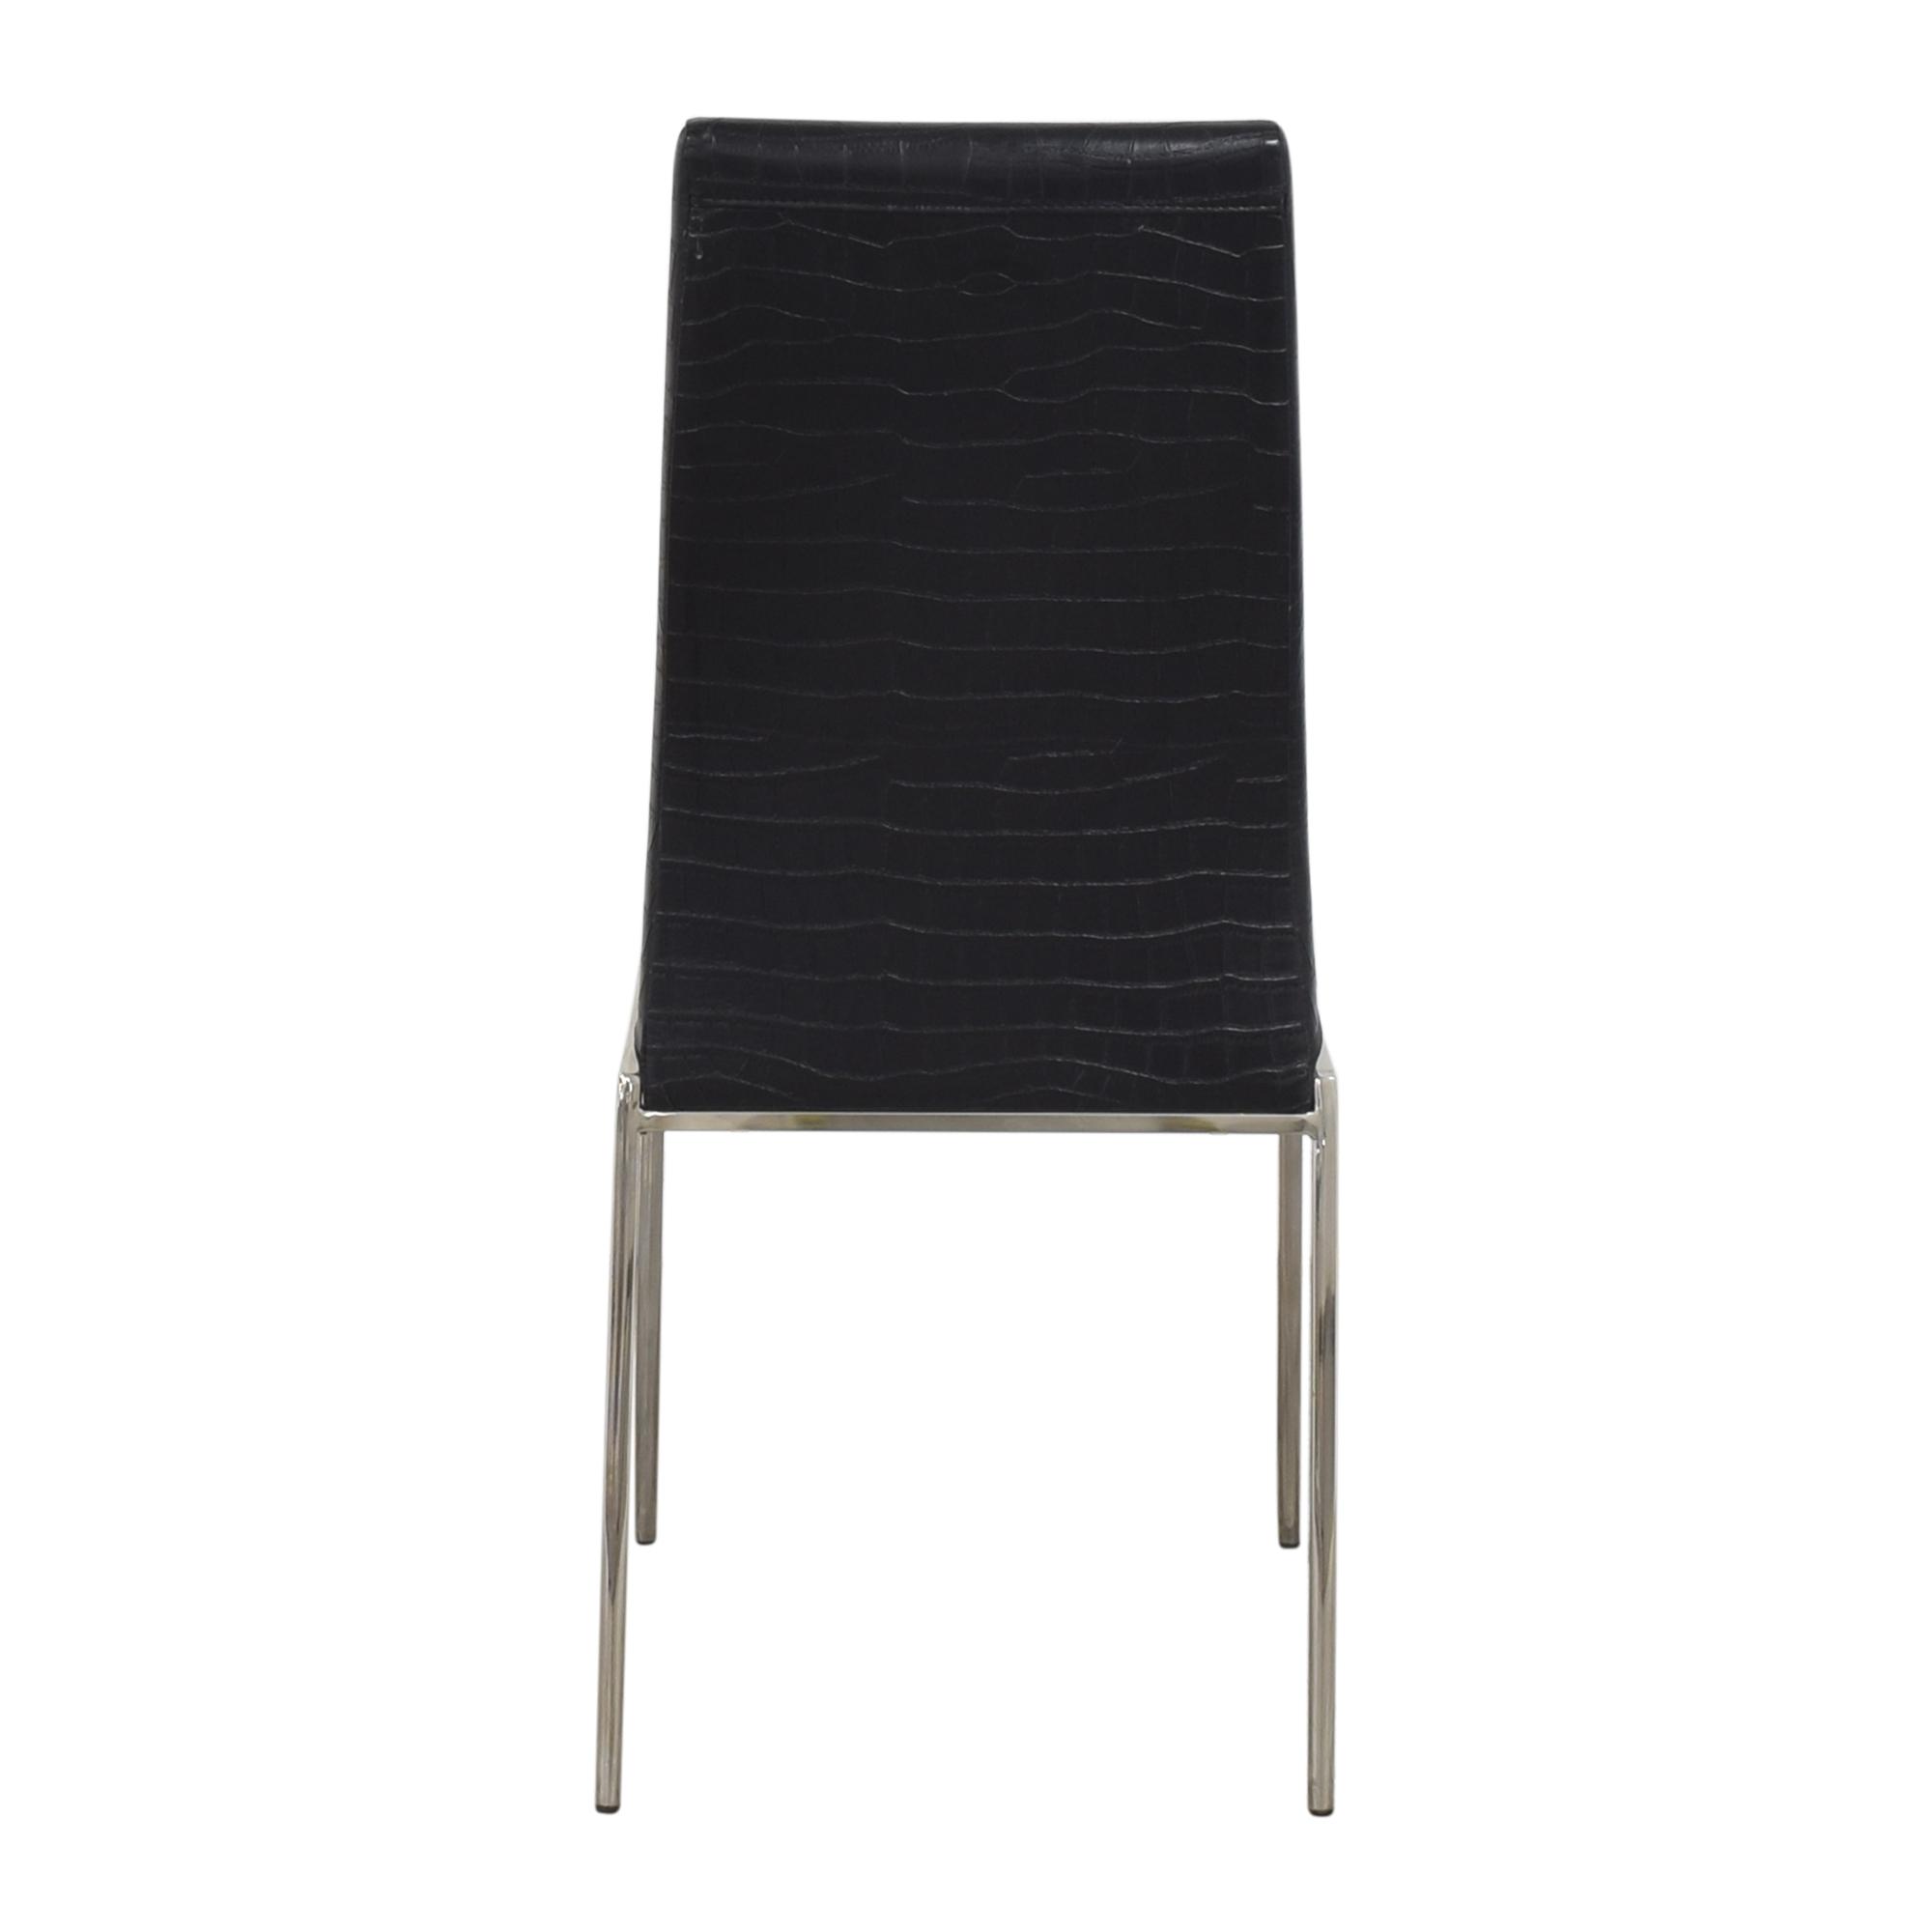 Stone International Stone International Claire Dining Side Chair black